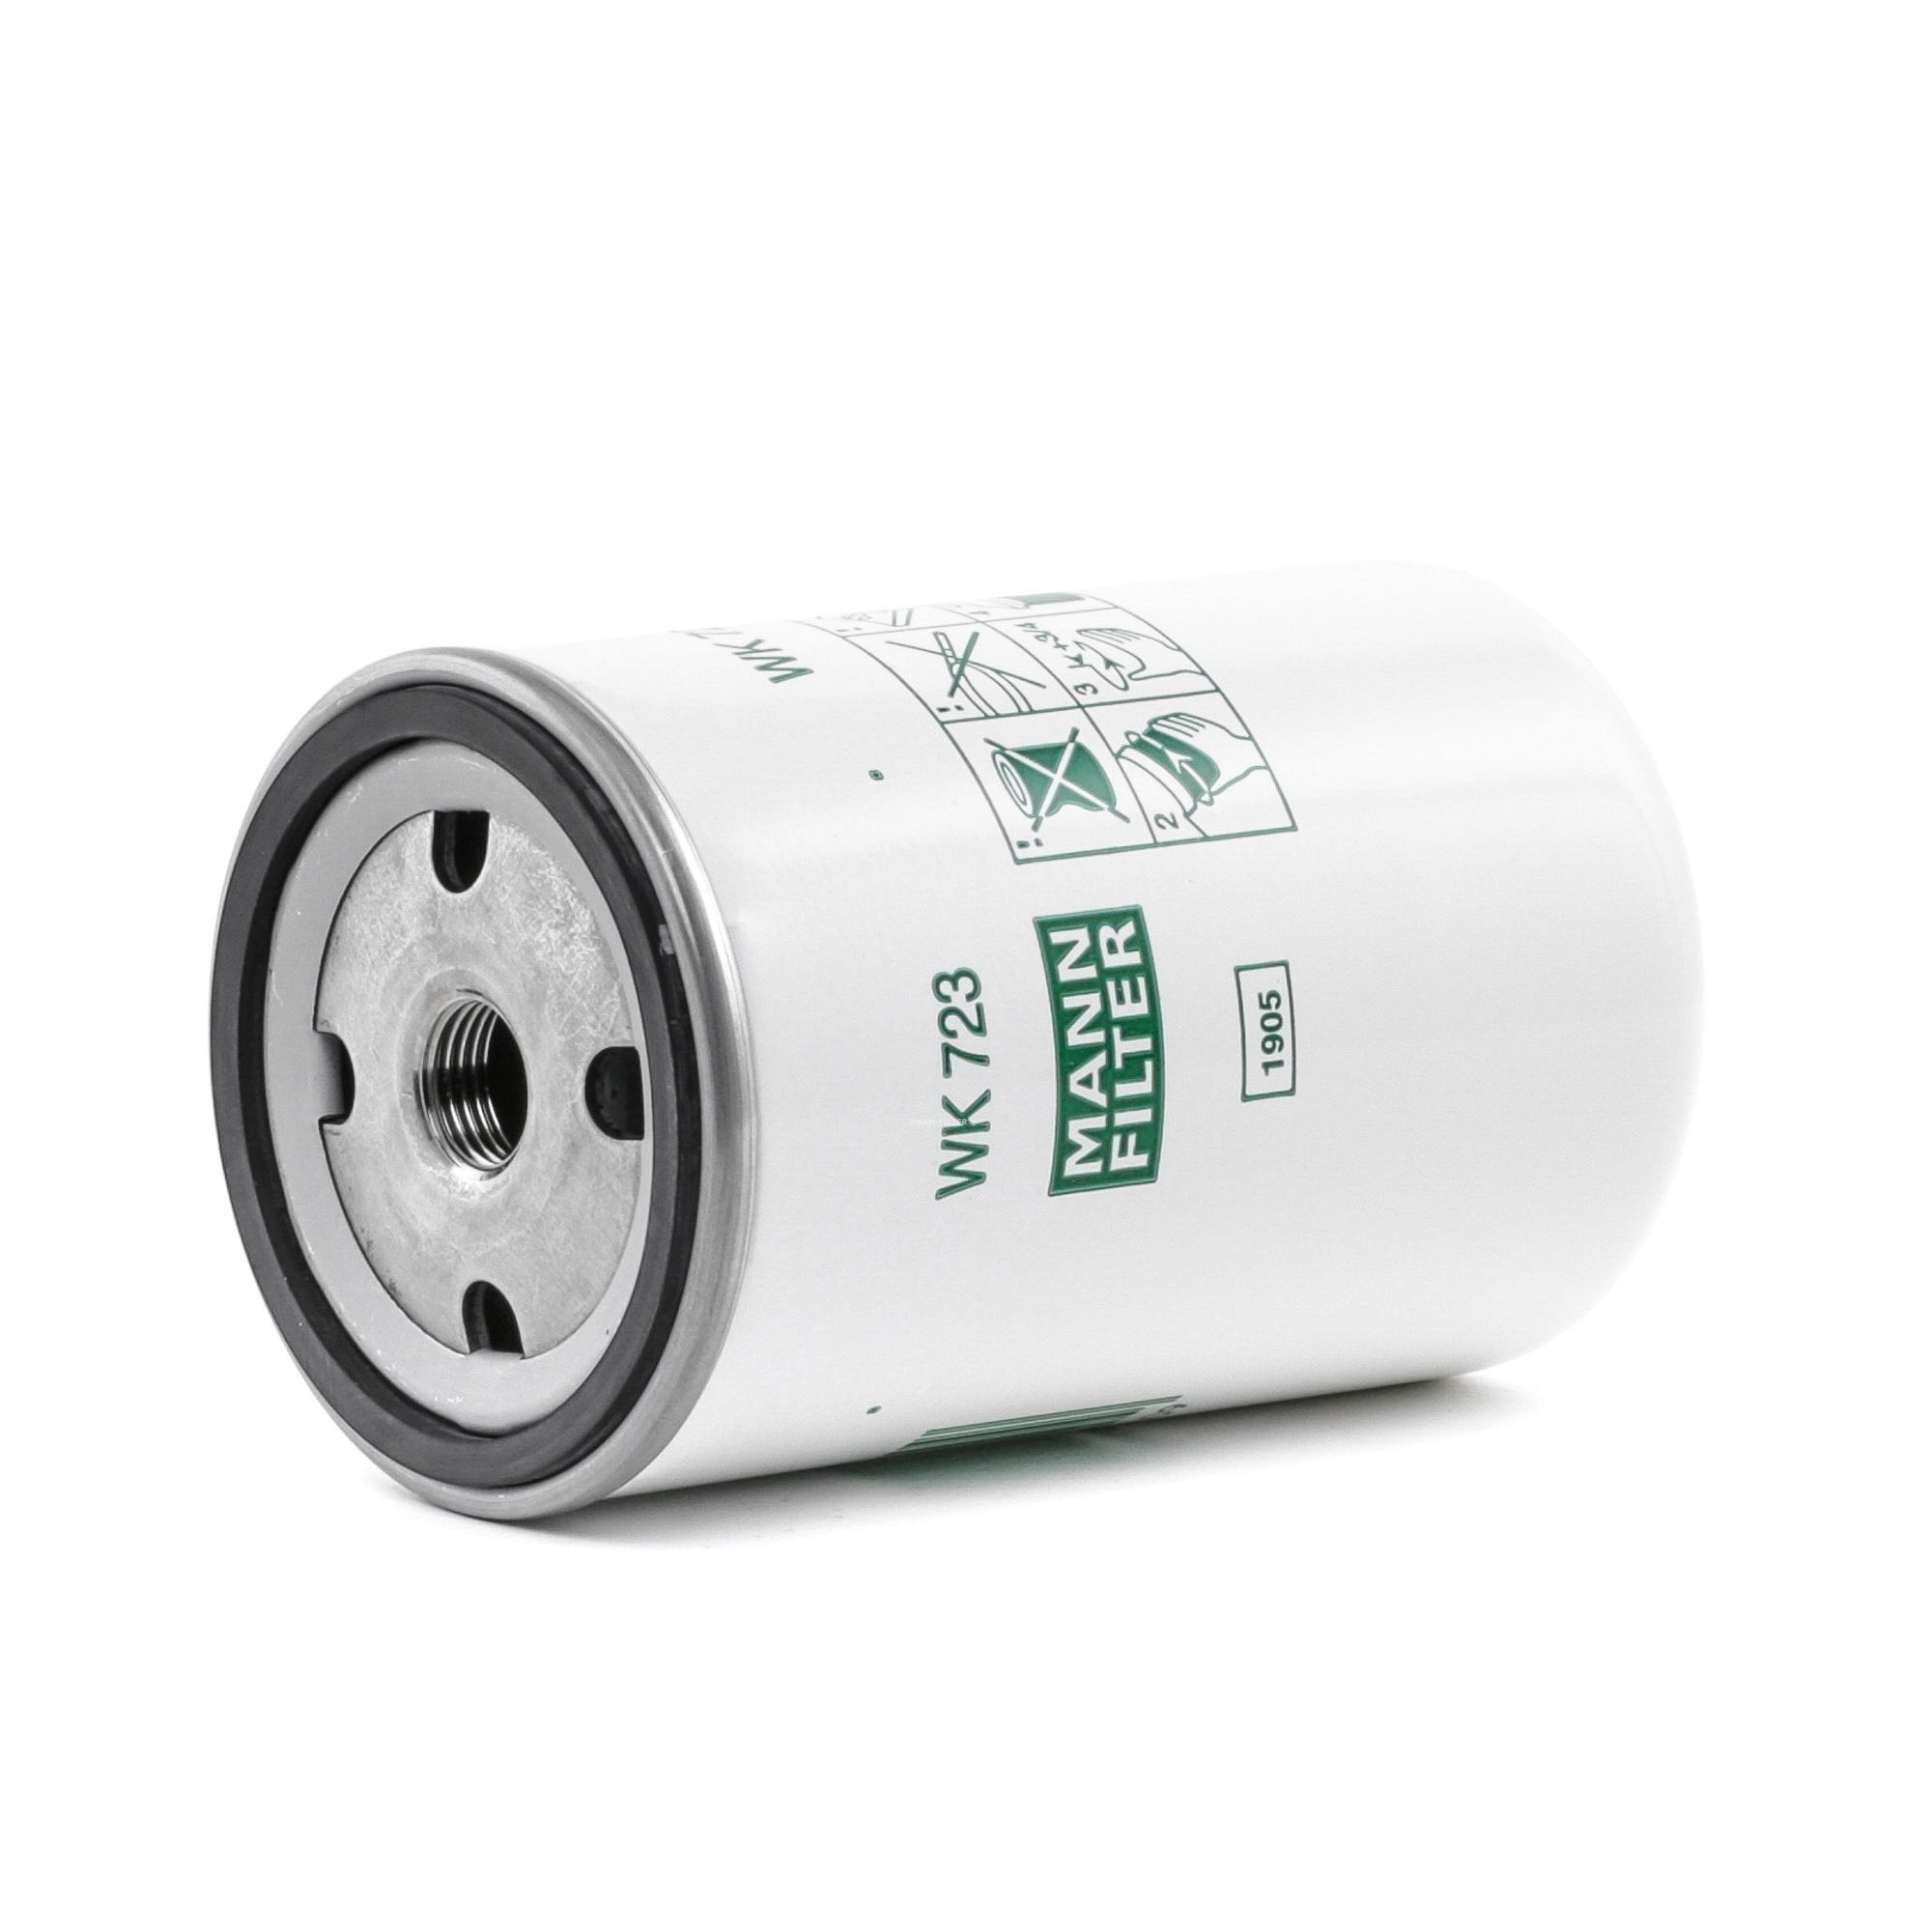 WK 723 MANN-FILTER Filtr paliwa do SCANIA 2 - series - kup teraz